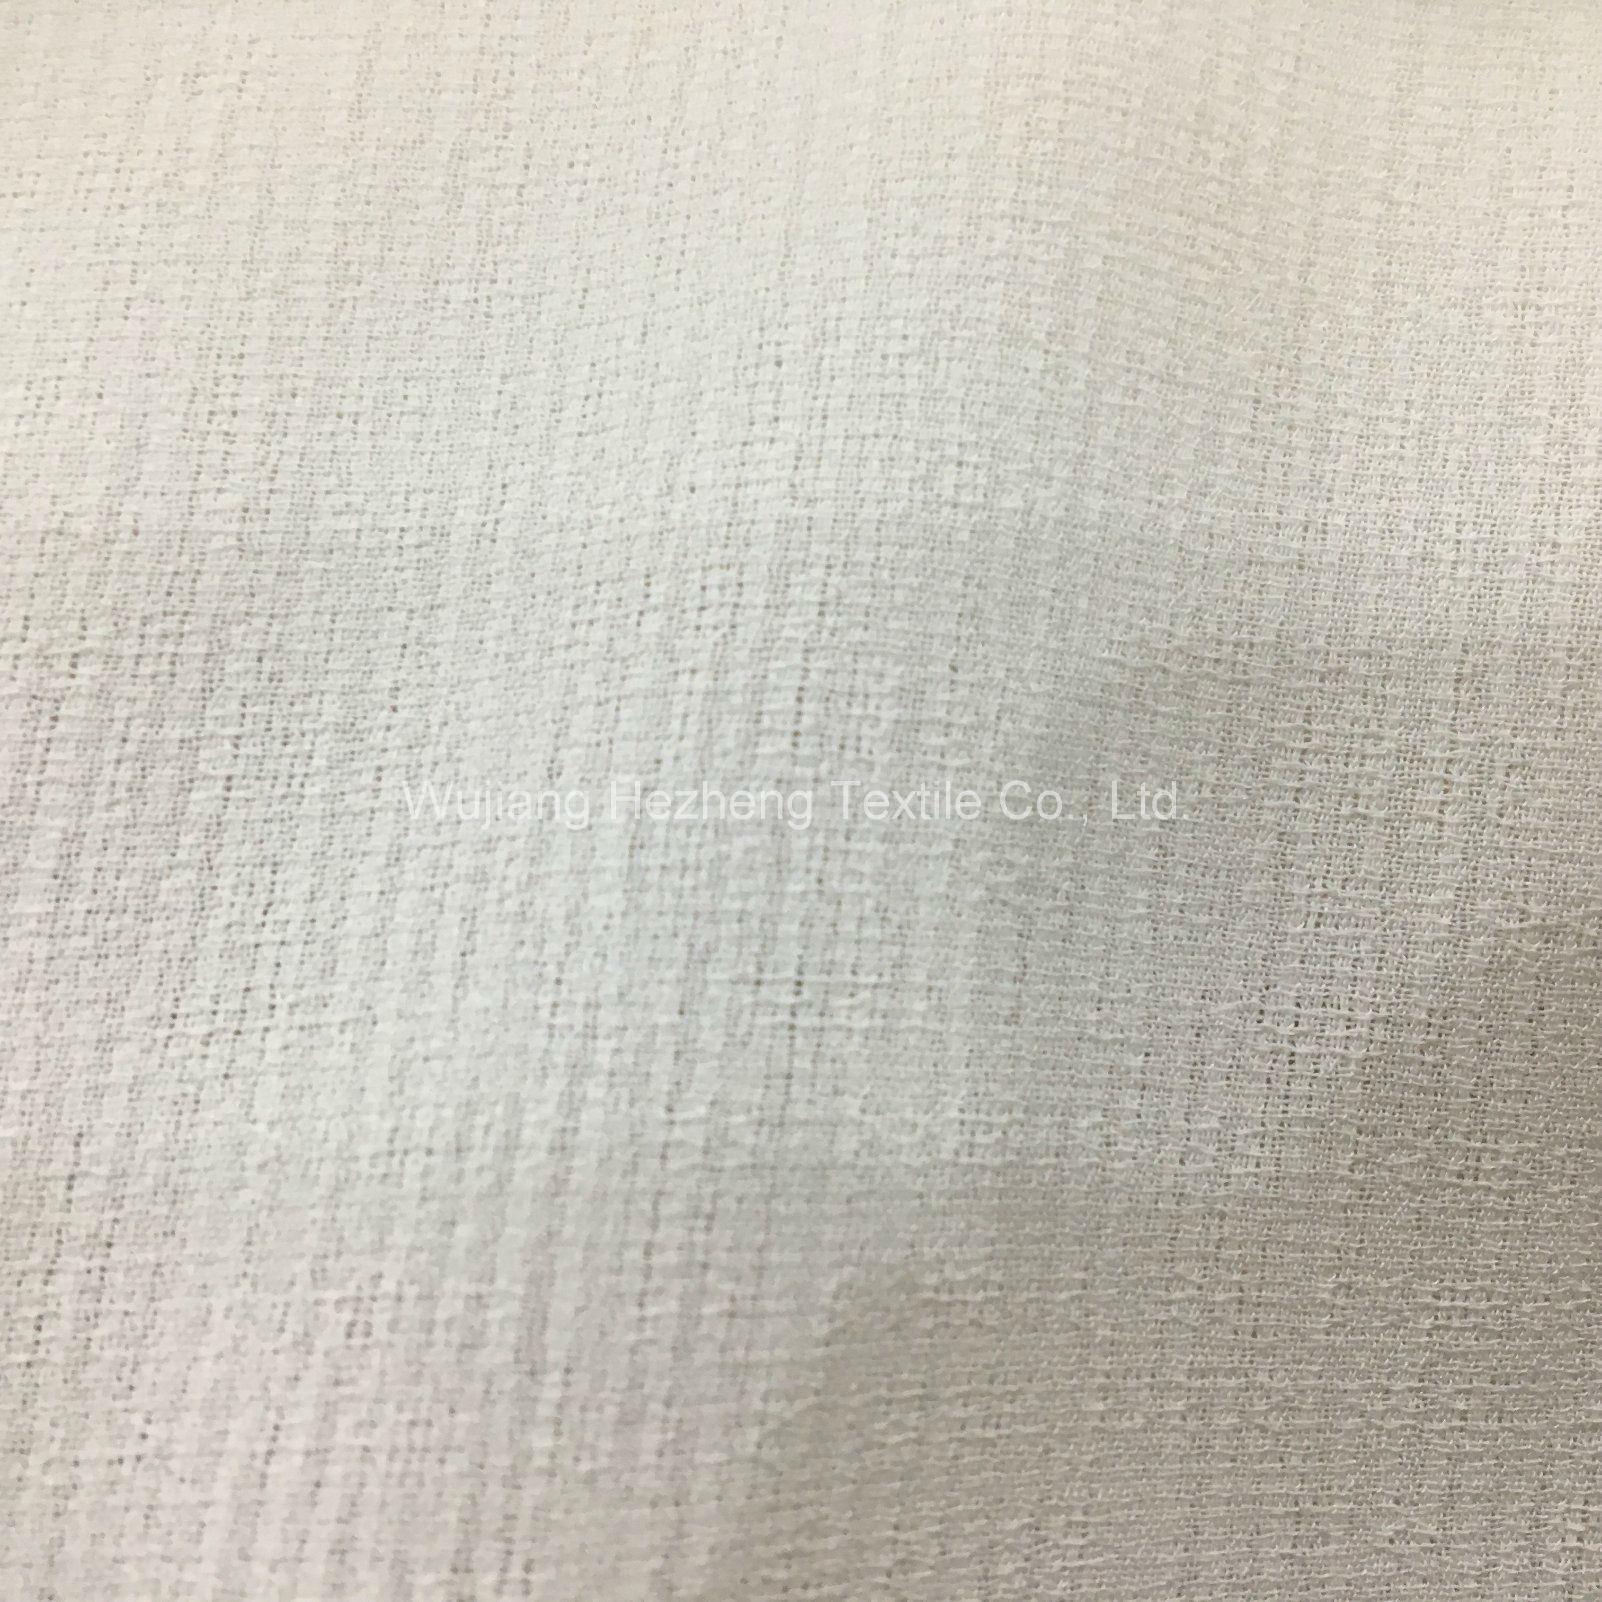 Hzs00263 Chiffon for Dresses